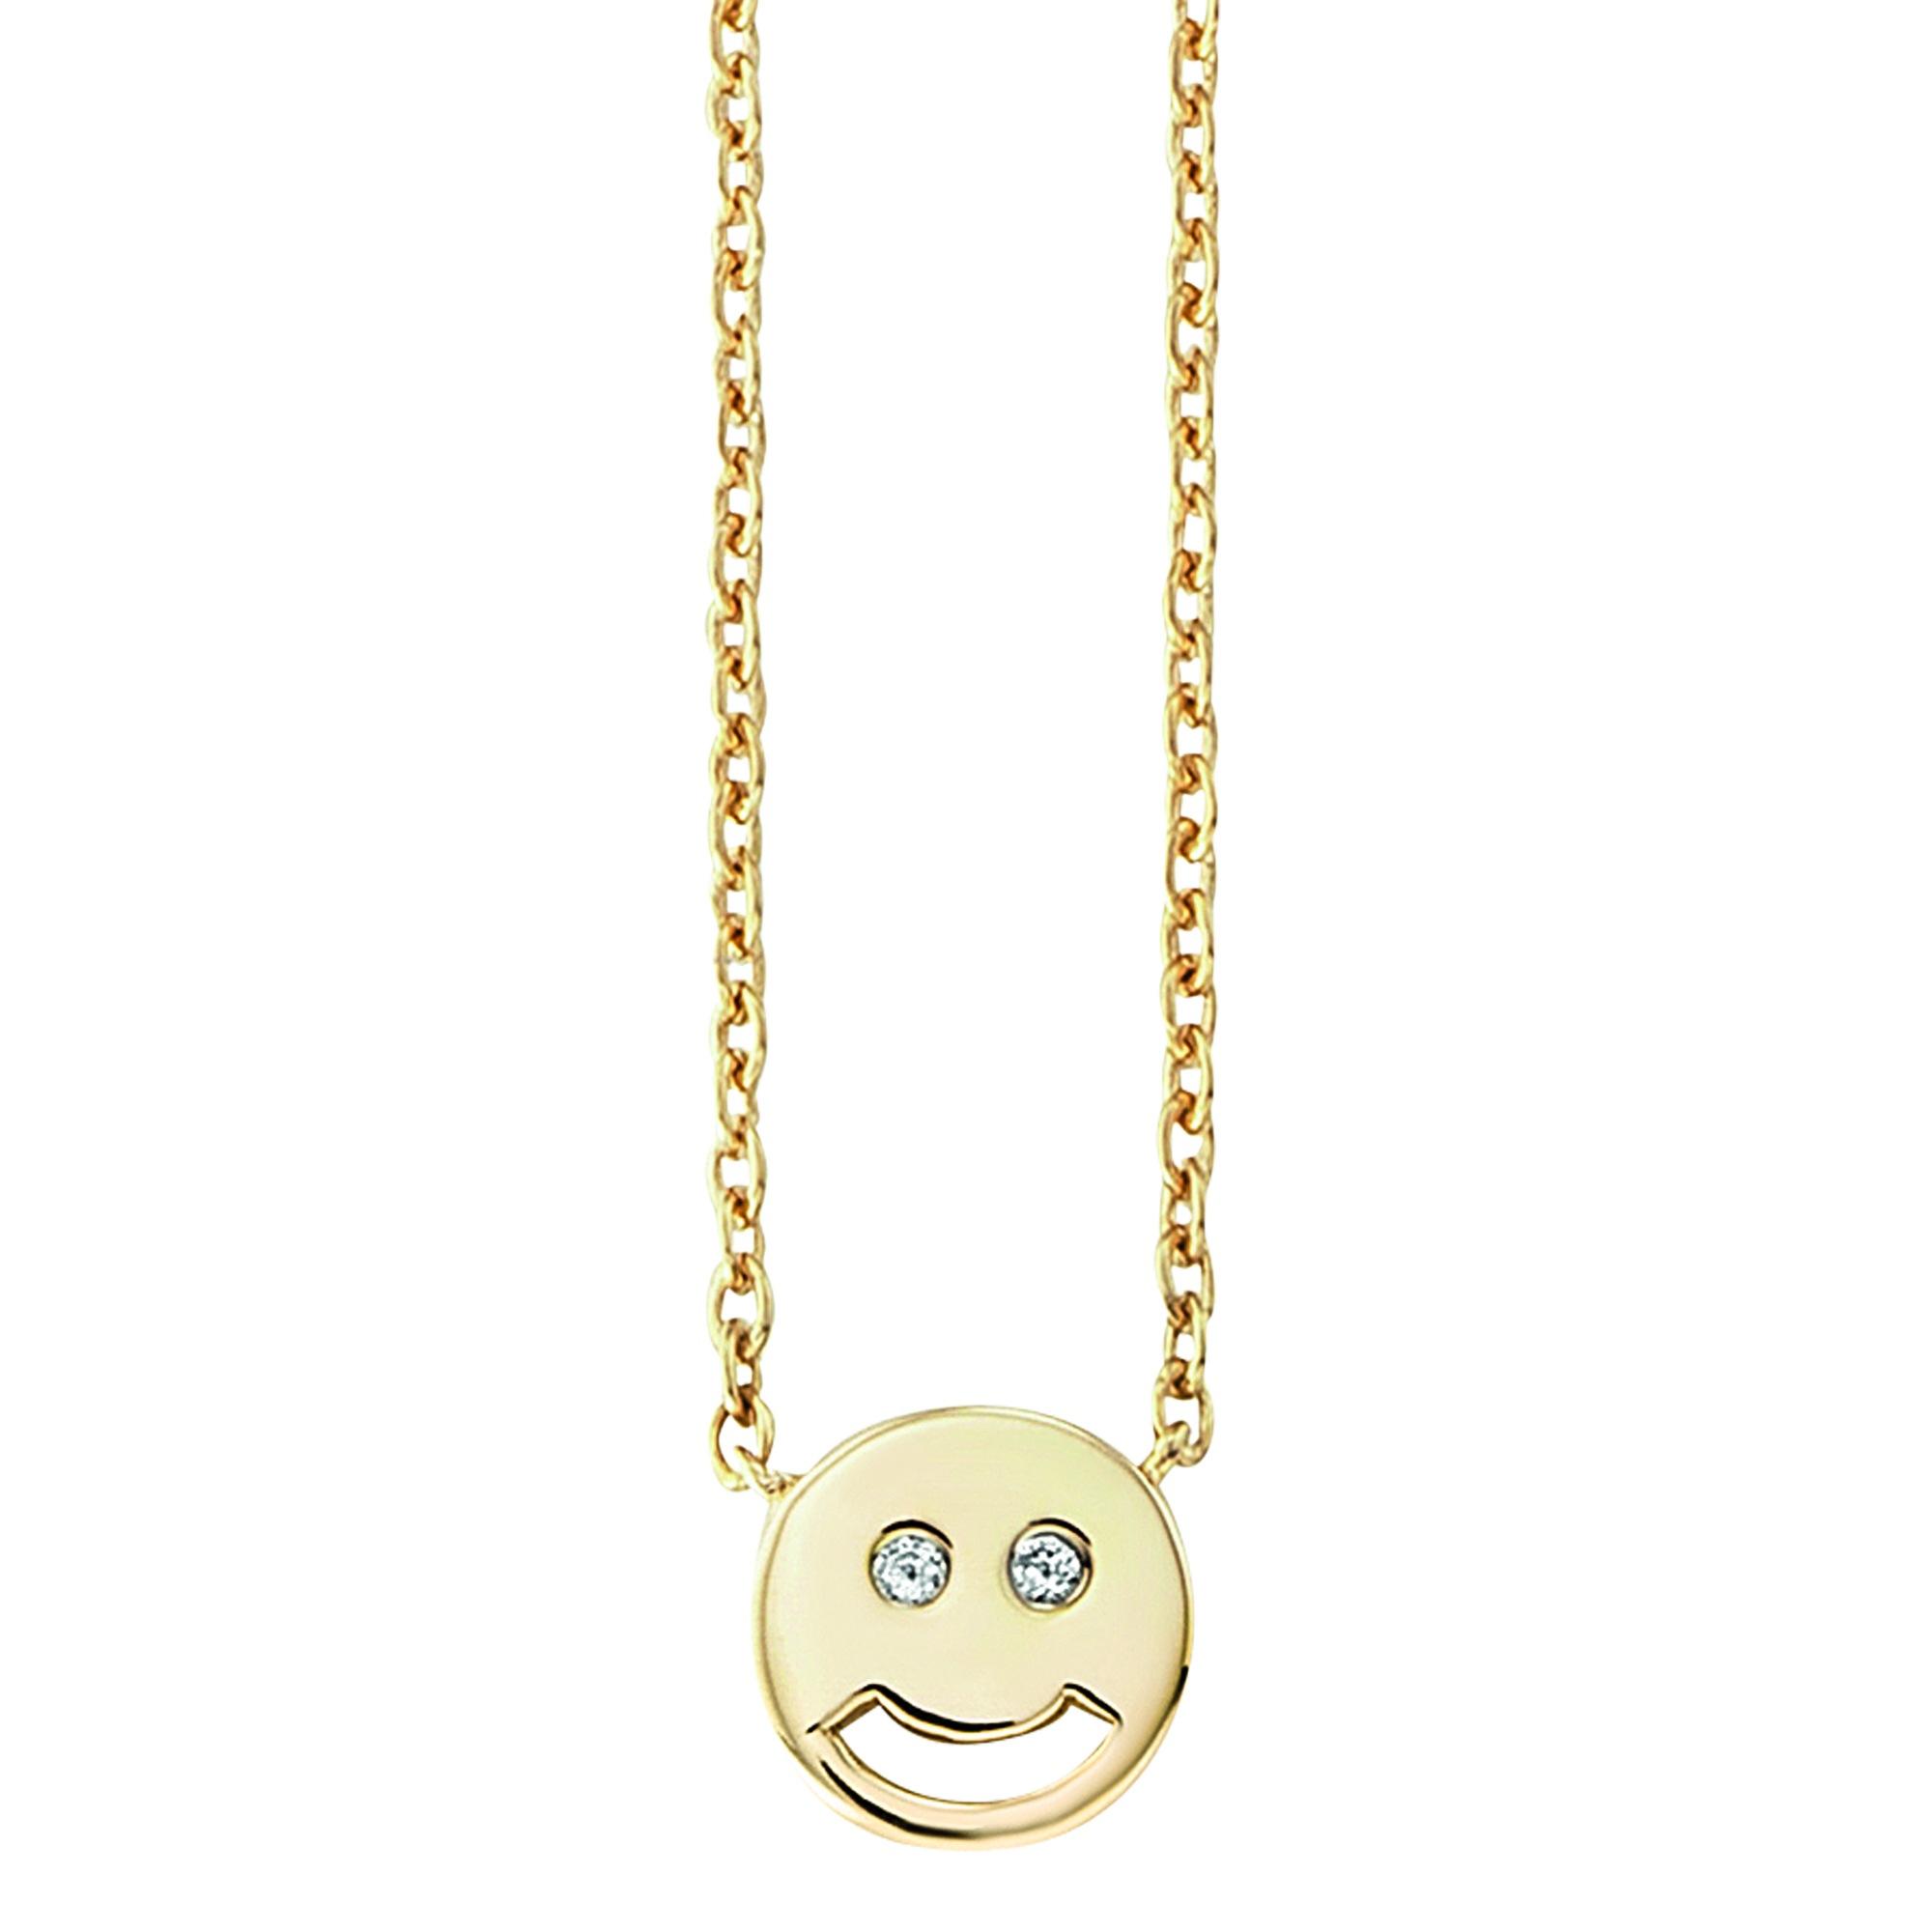 Cai Collier 925/- Sterling Silber vergoldet Zirkonia Smiley | Schmuck > Halsketten > Colliers | Gelb | Metall | Cai